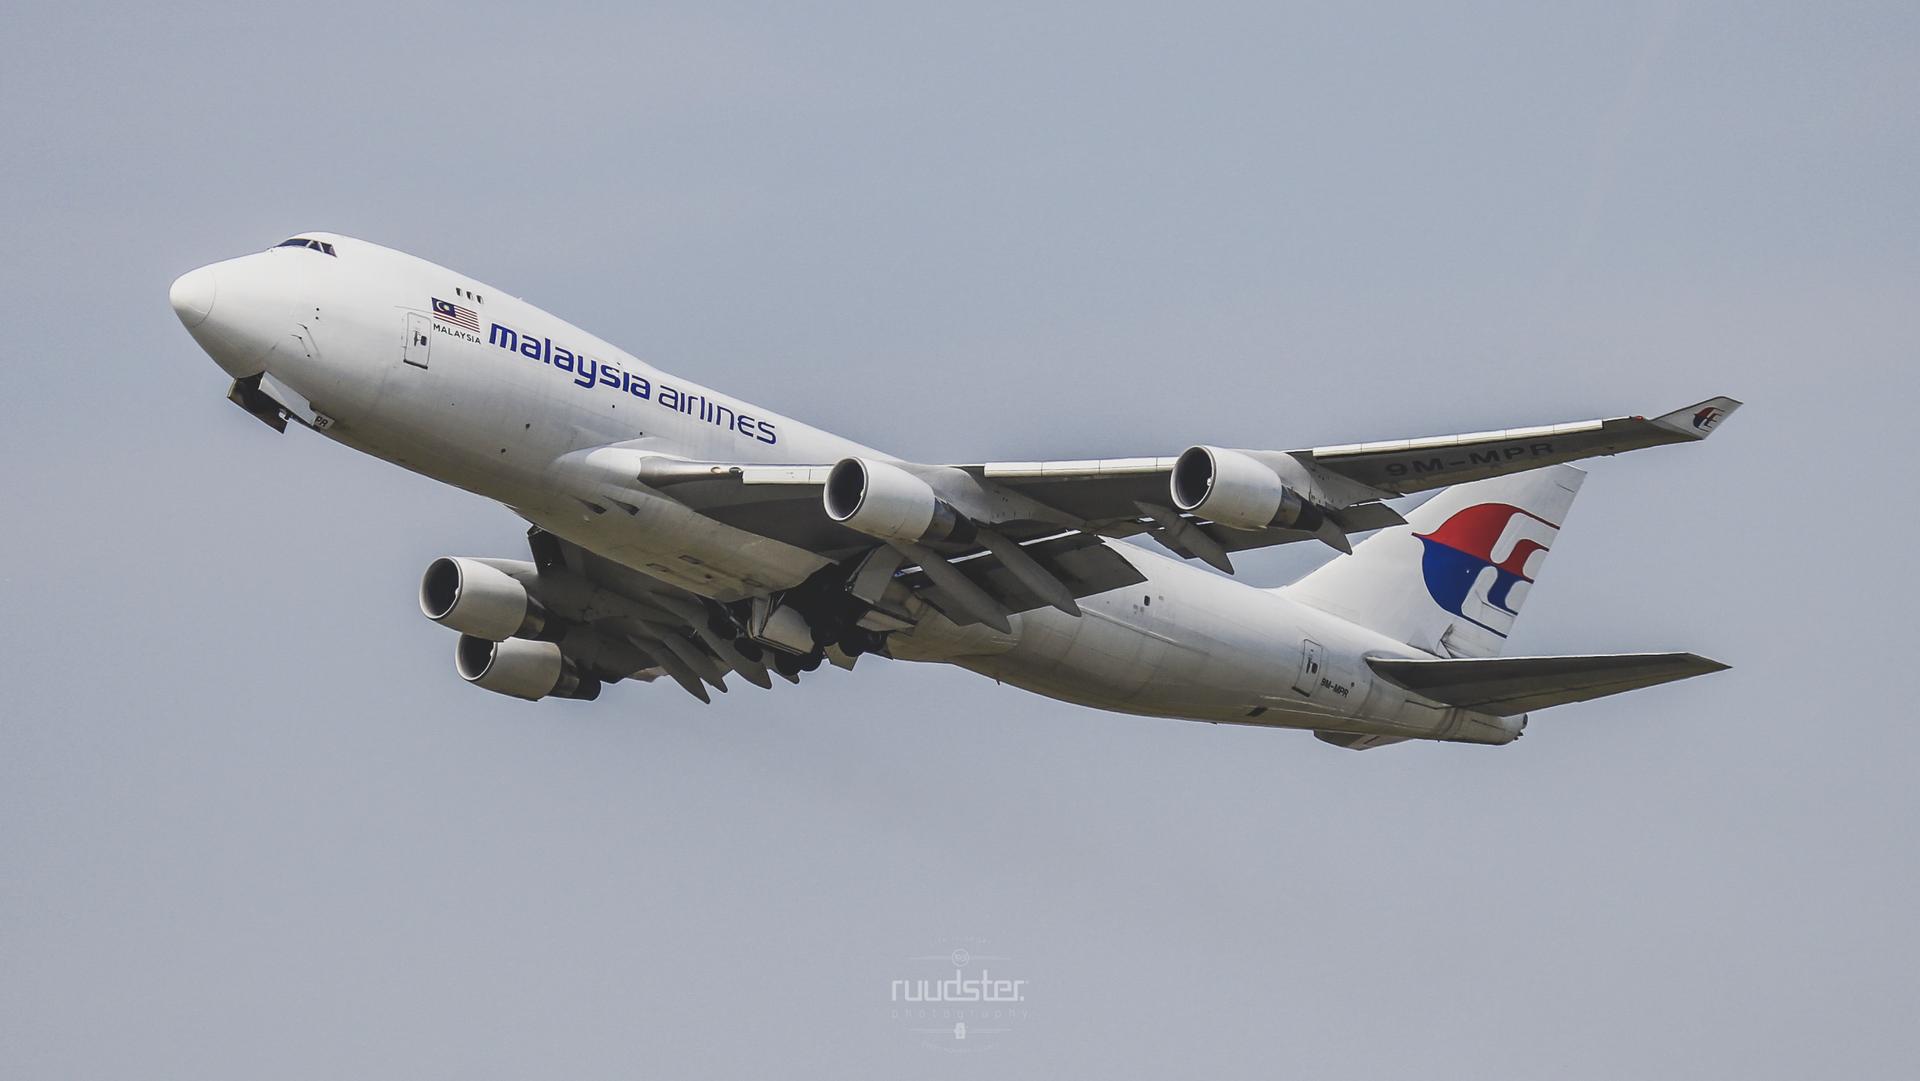 9M-MPR | 2006 | Boeing 747-400F